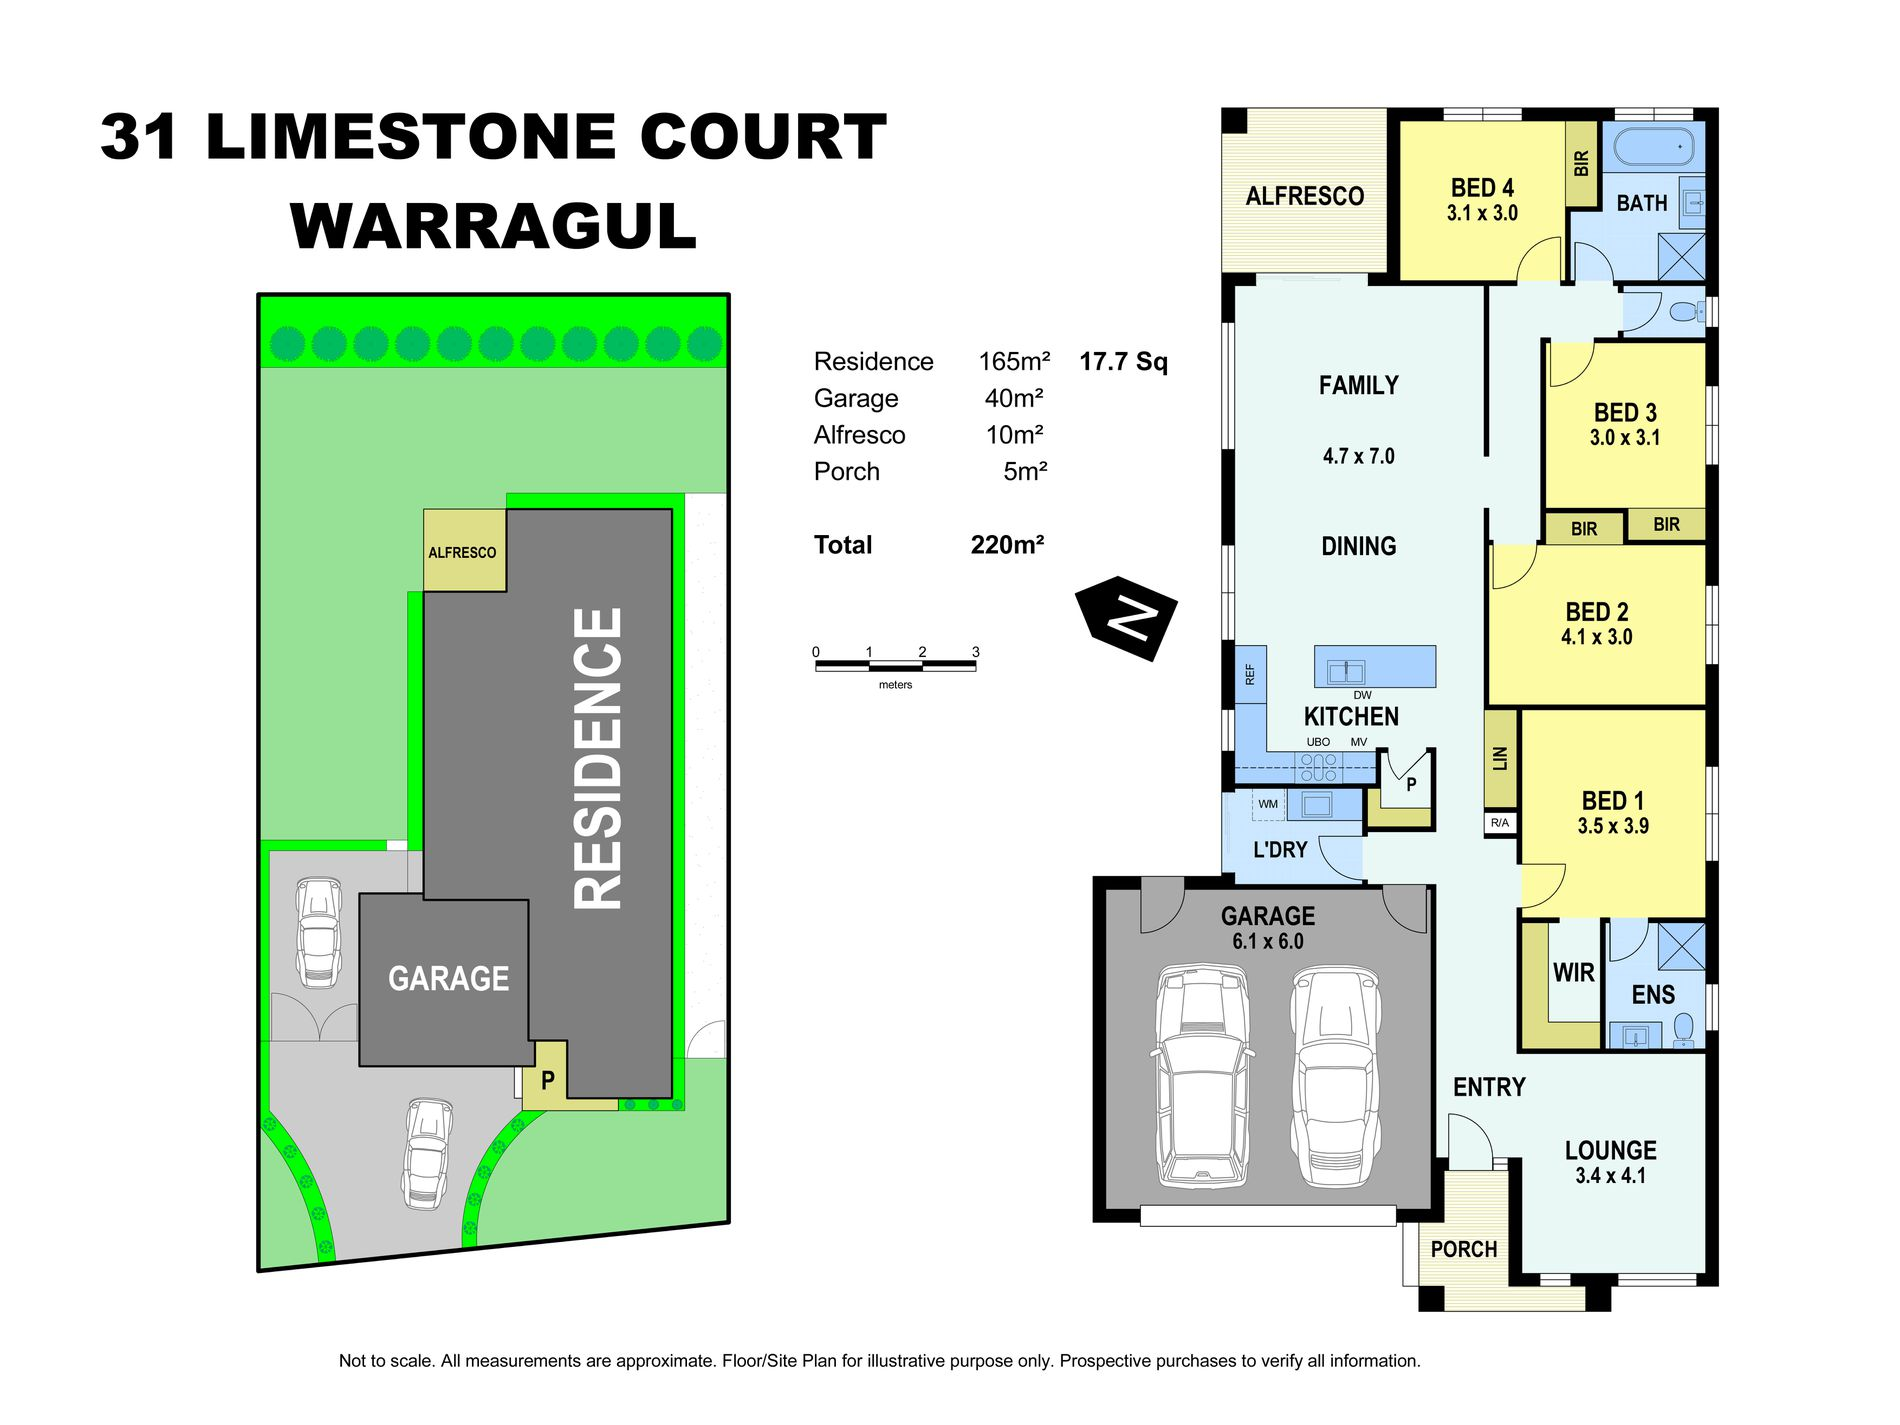 31 Limestone Court, Warragul